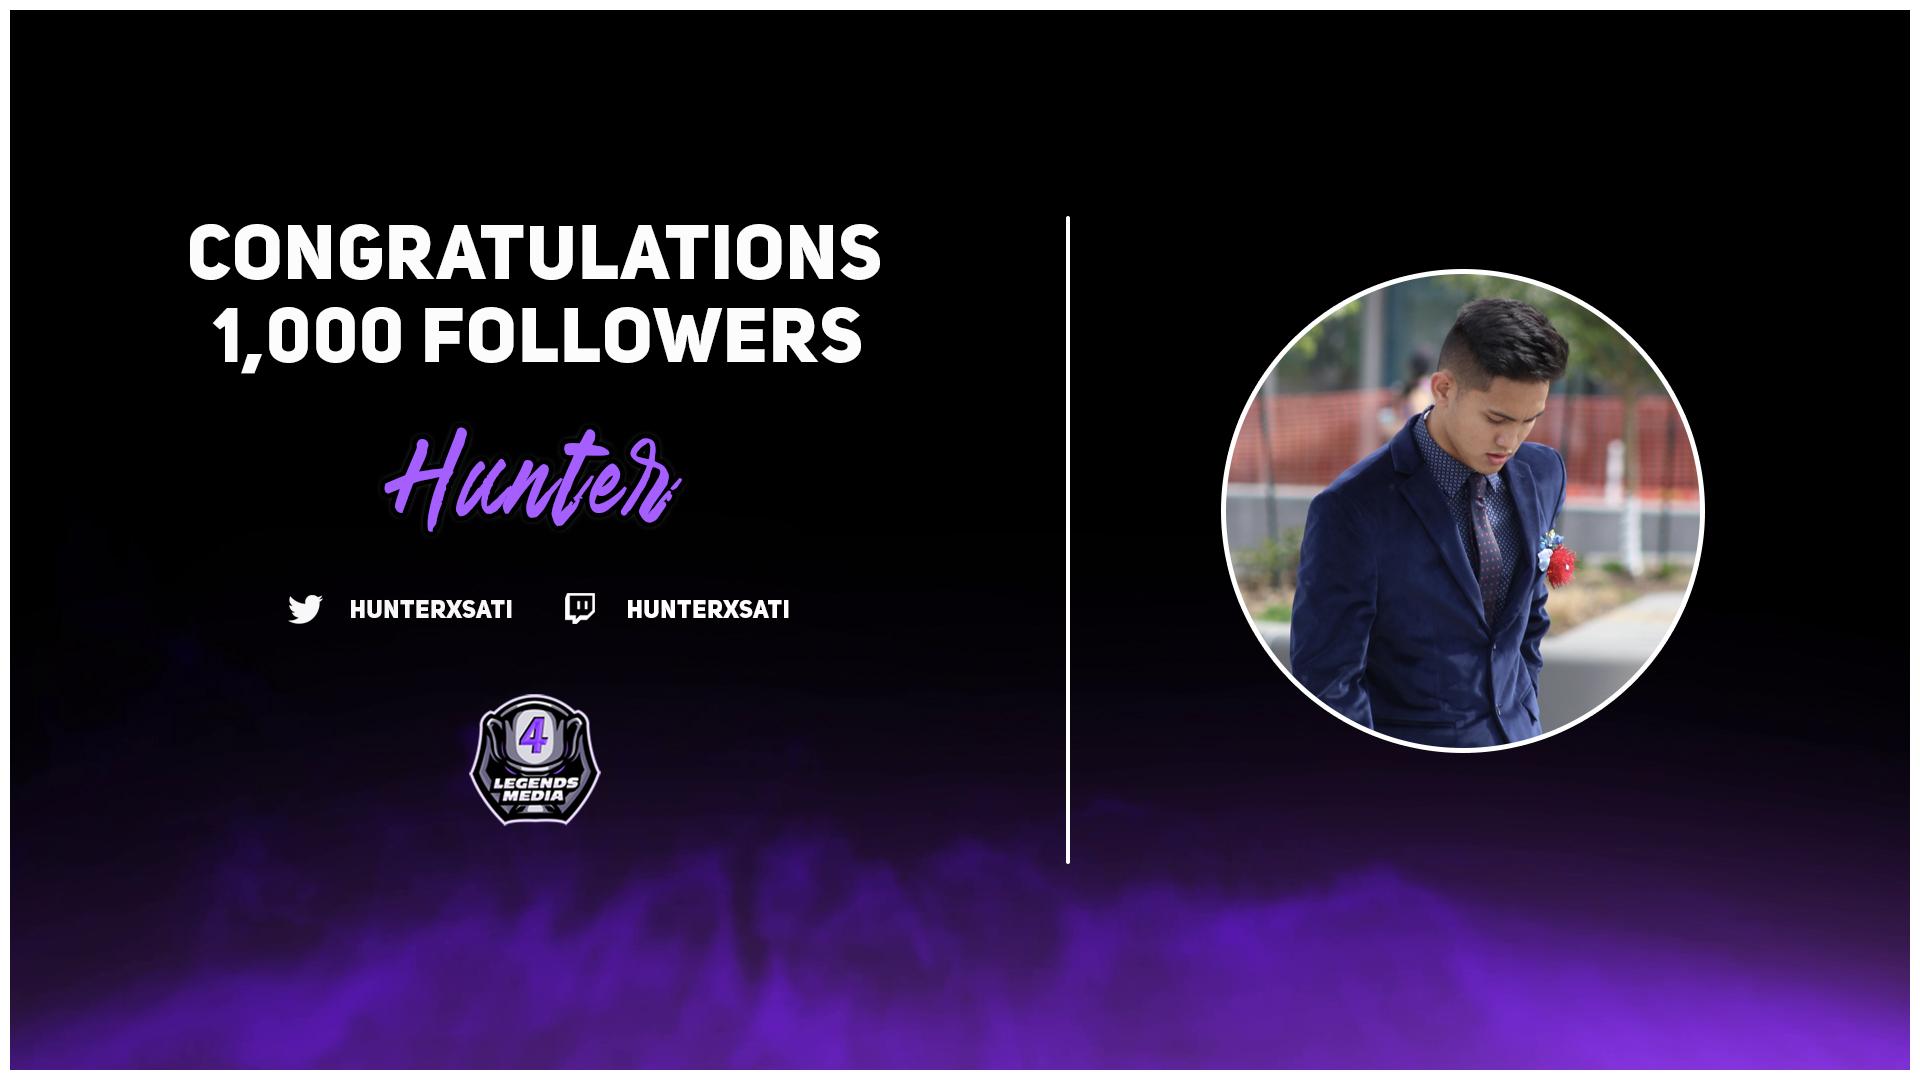 Congrats on 1,000 Twitch Followers, Hunter!